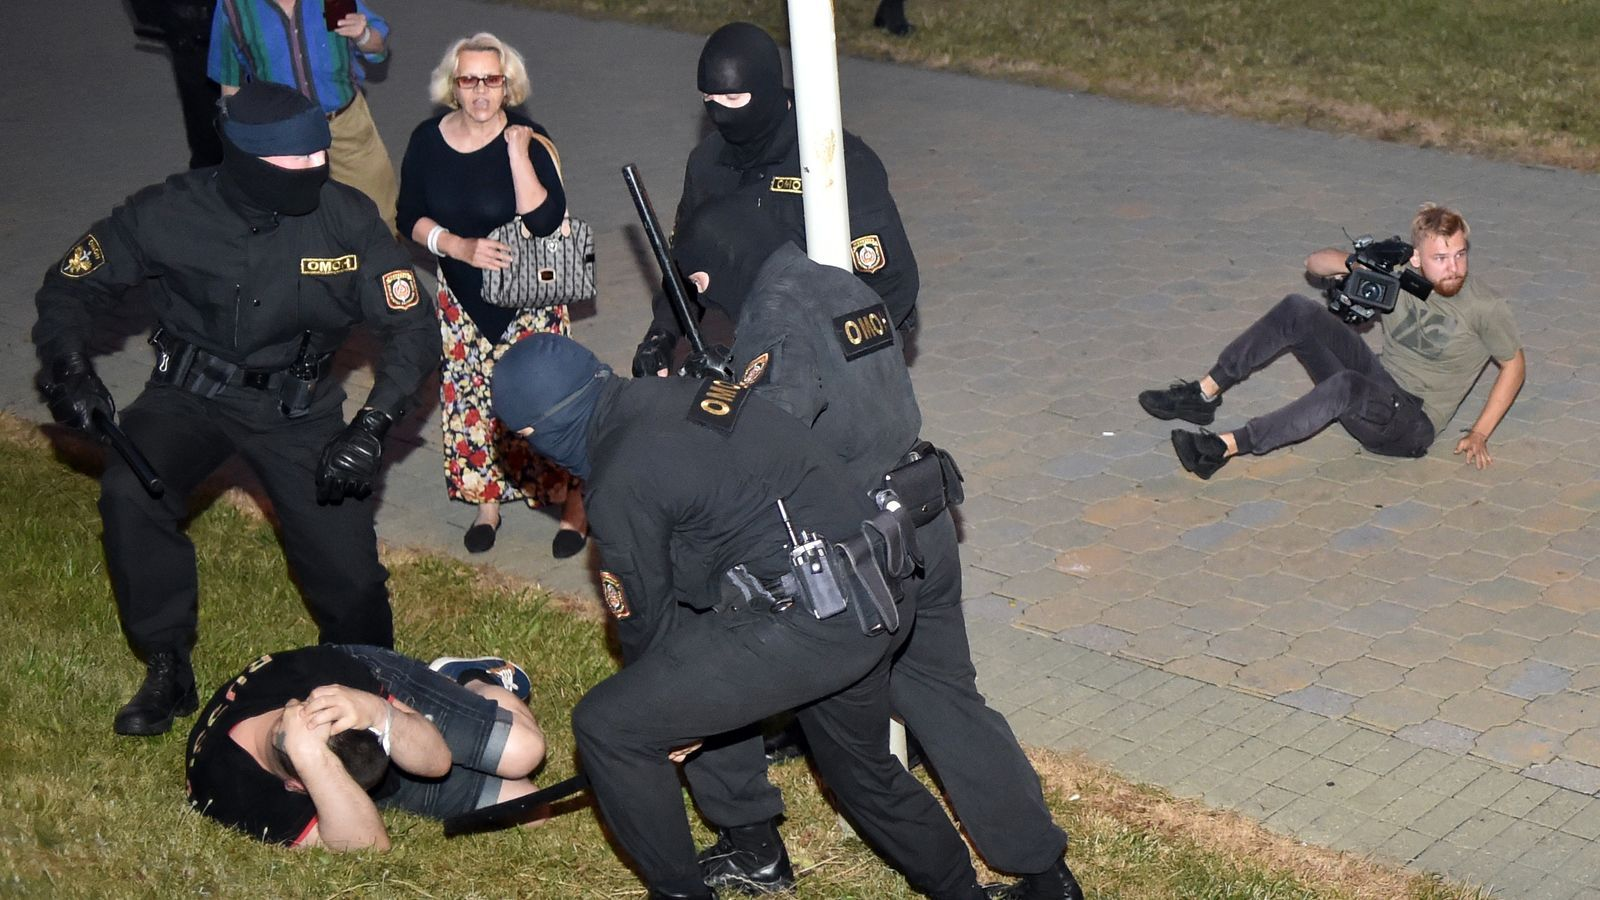 La policia agredint un manifestant a Minsk